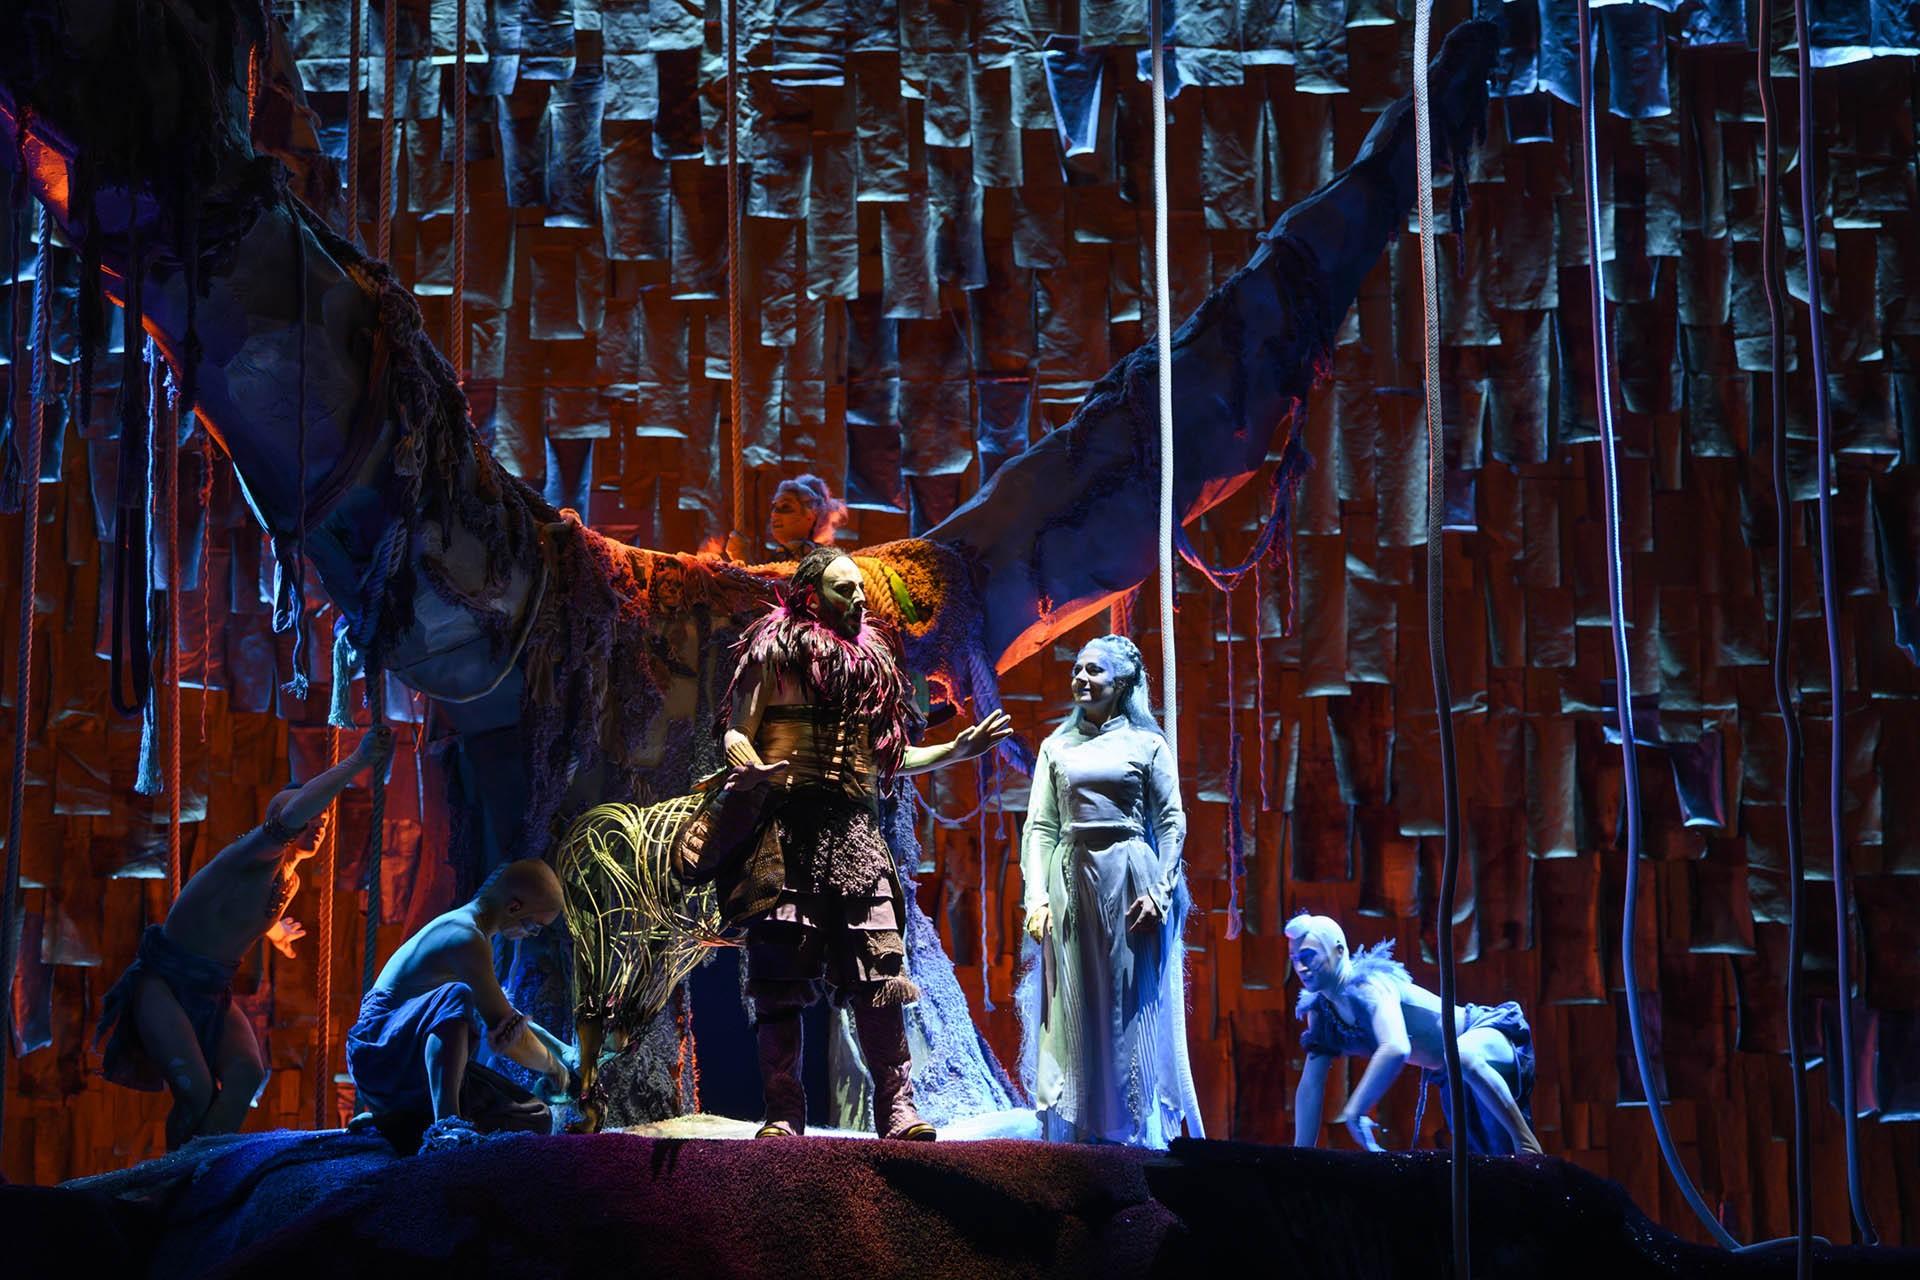 Opéra Royal de Wallonie - La Clemenza di Tito